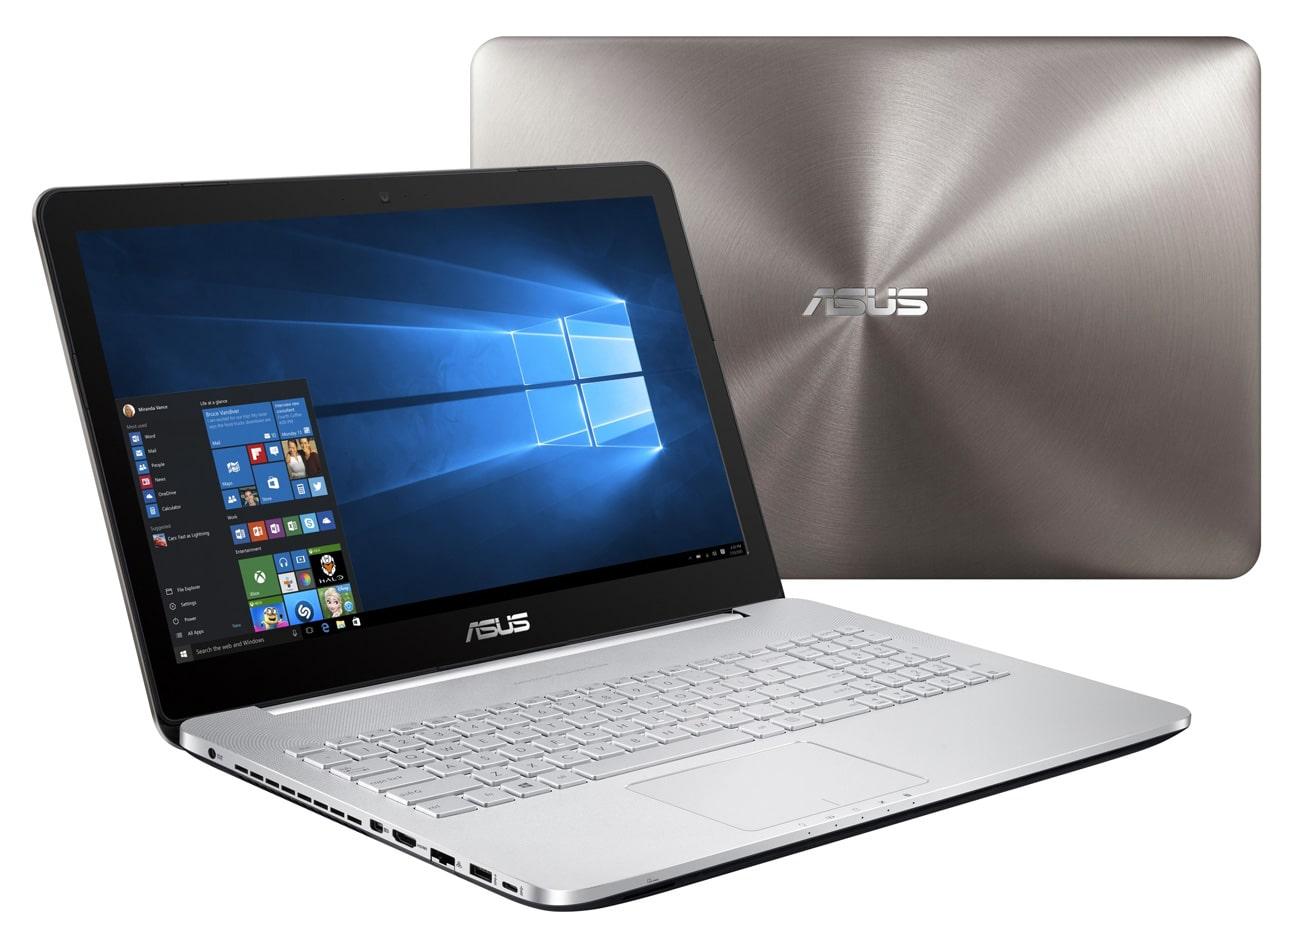 Asus N552VW-FI035T, PC portable 15 pouces 4K IPS SSD Blu-Ray i7 960M à 1520€